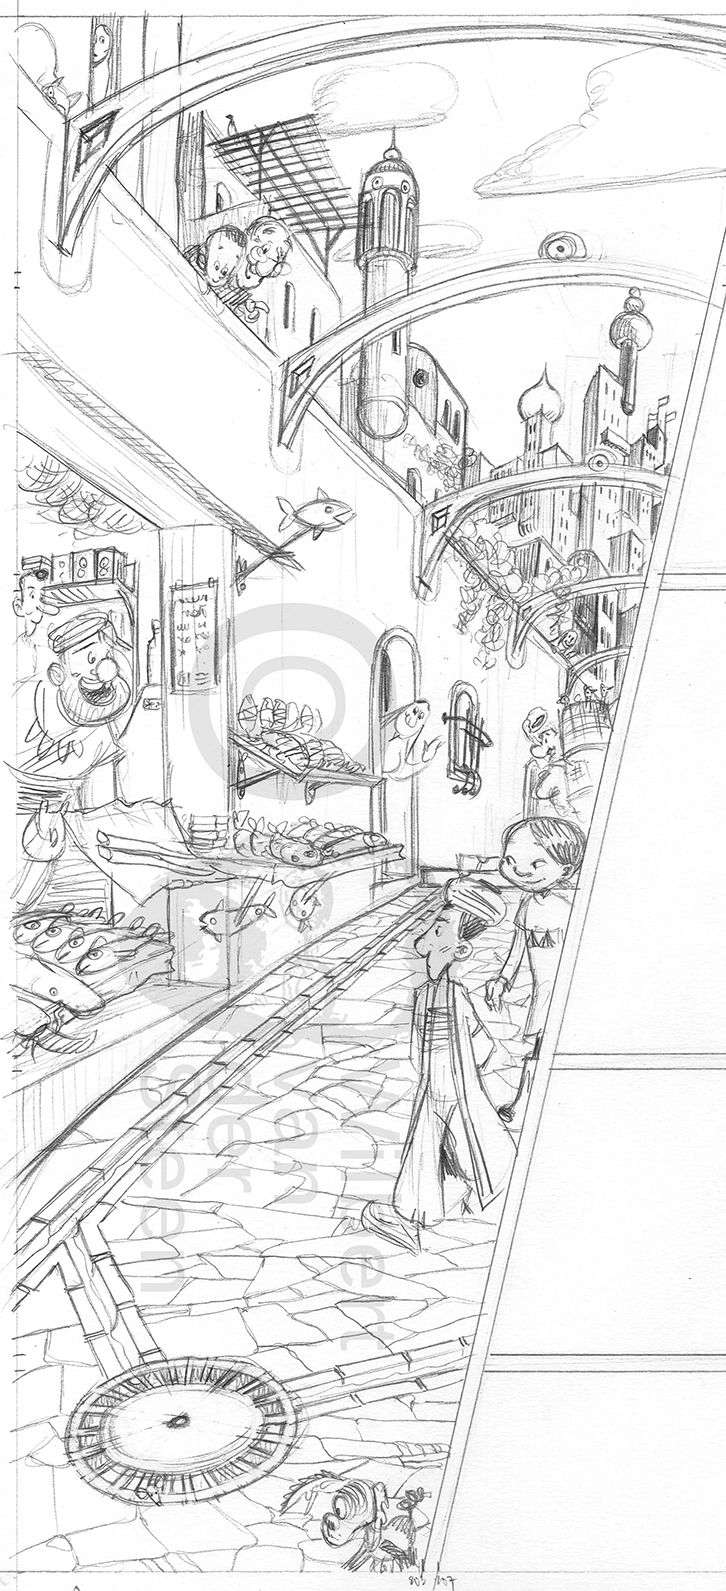 Sketch page comic Ayak + Por, the lonely sultan (November 2015)